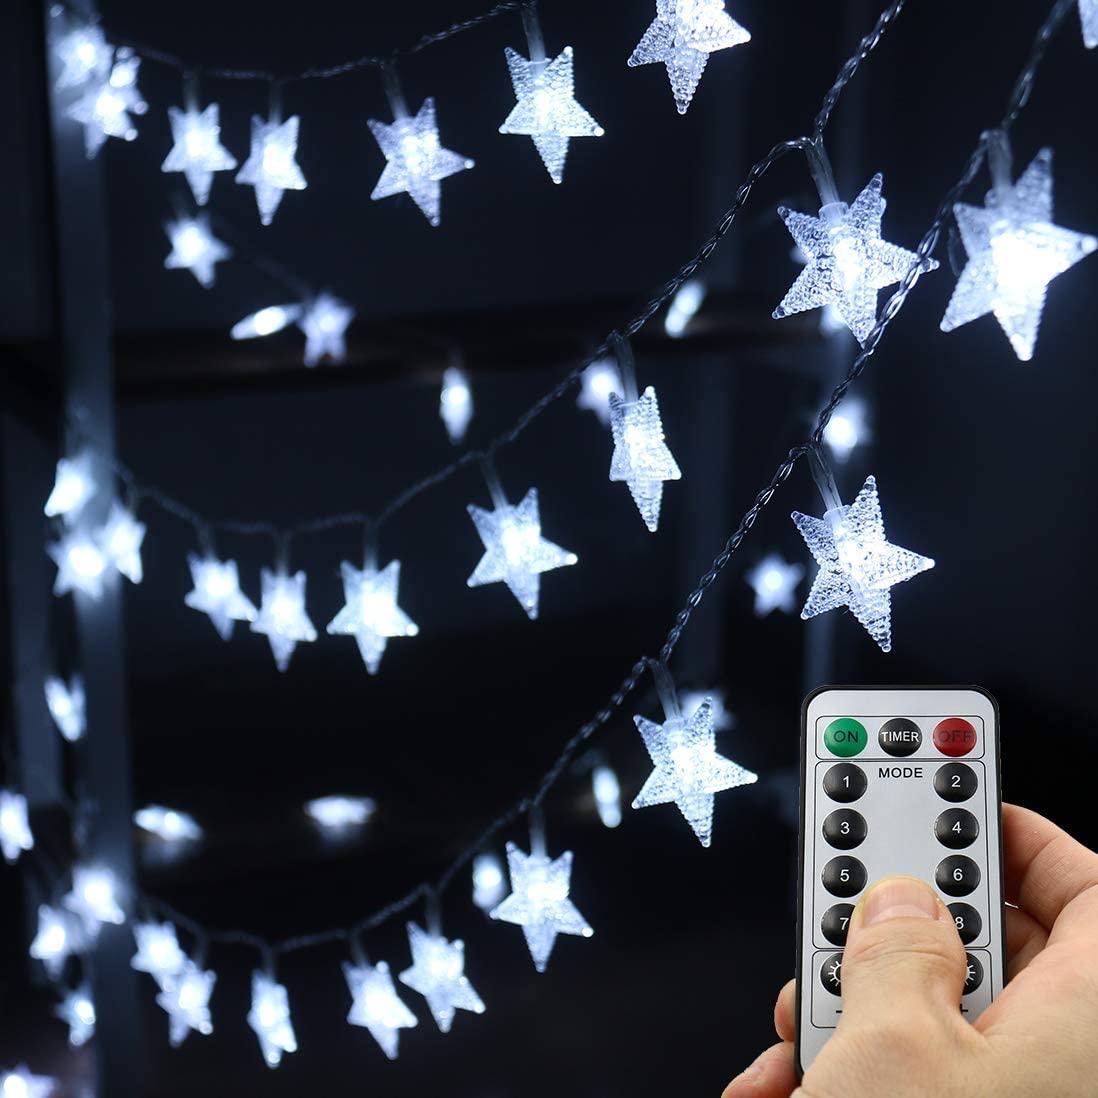 Xingpold Led Star String Lights,Outdoor Battery Operated String Lights White Fairy Lights,16.4 Feet 50 LED Waterproof Christmas Tree Lights for Indoor Wedding Halloween Camping Umbrella Birthday Party